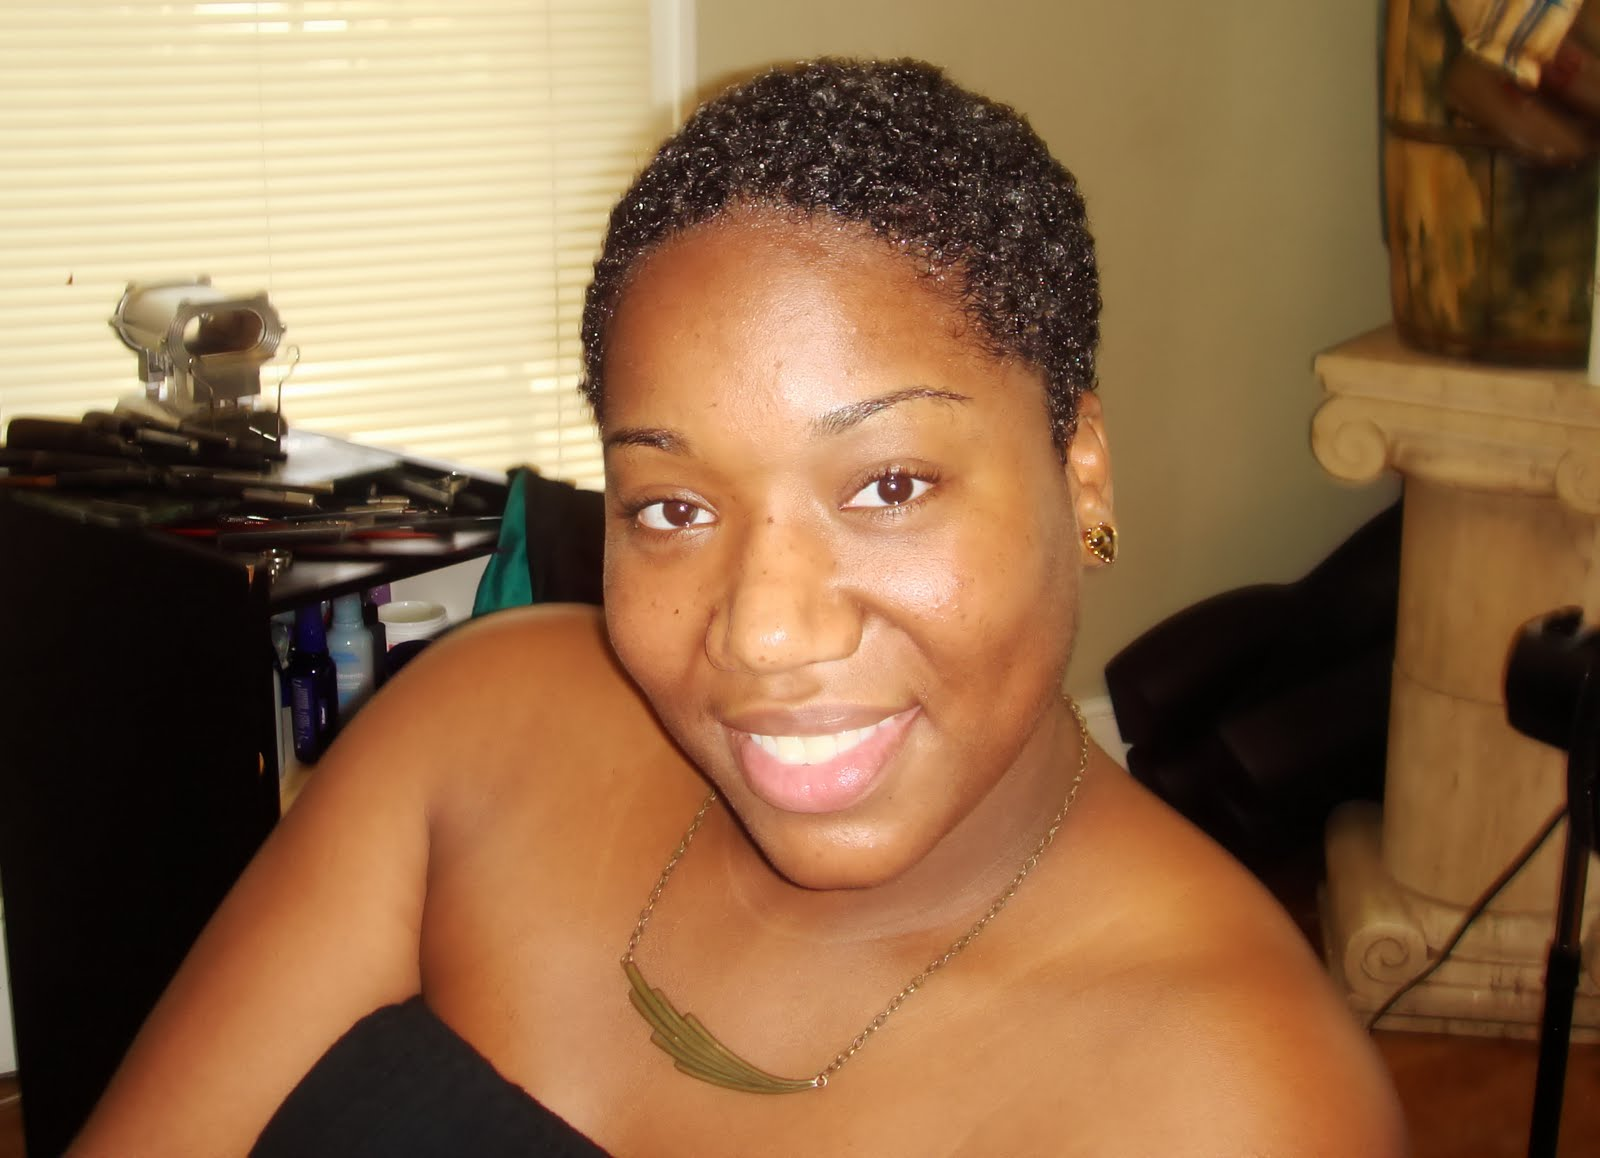 Alexandra, the 'Youtube Makeup Guru' - A Story of Transition